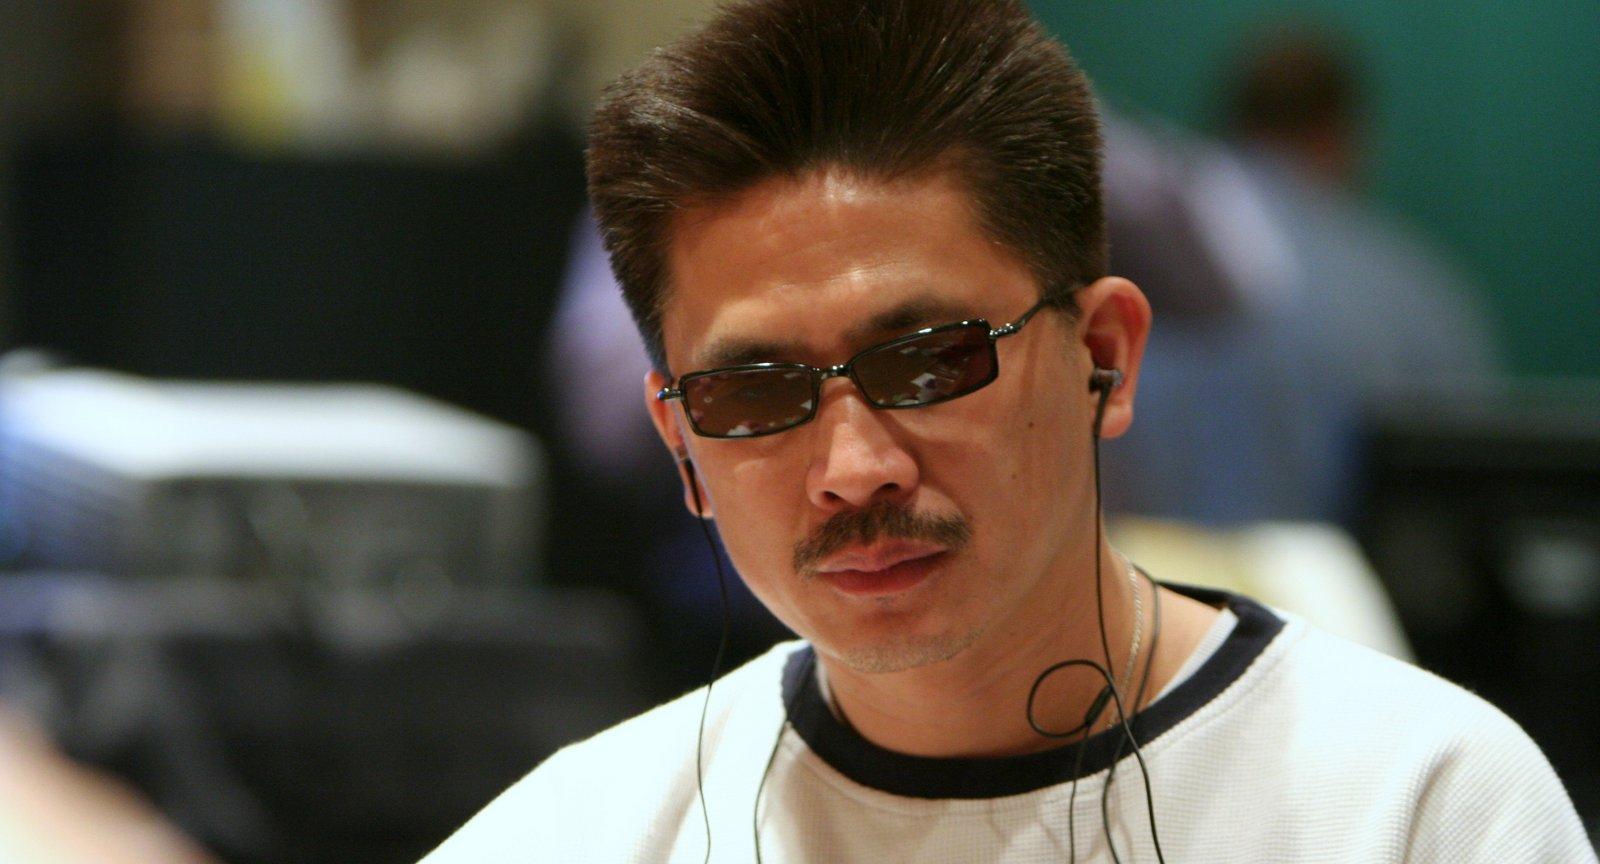 Young Phan